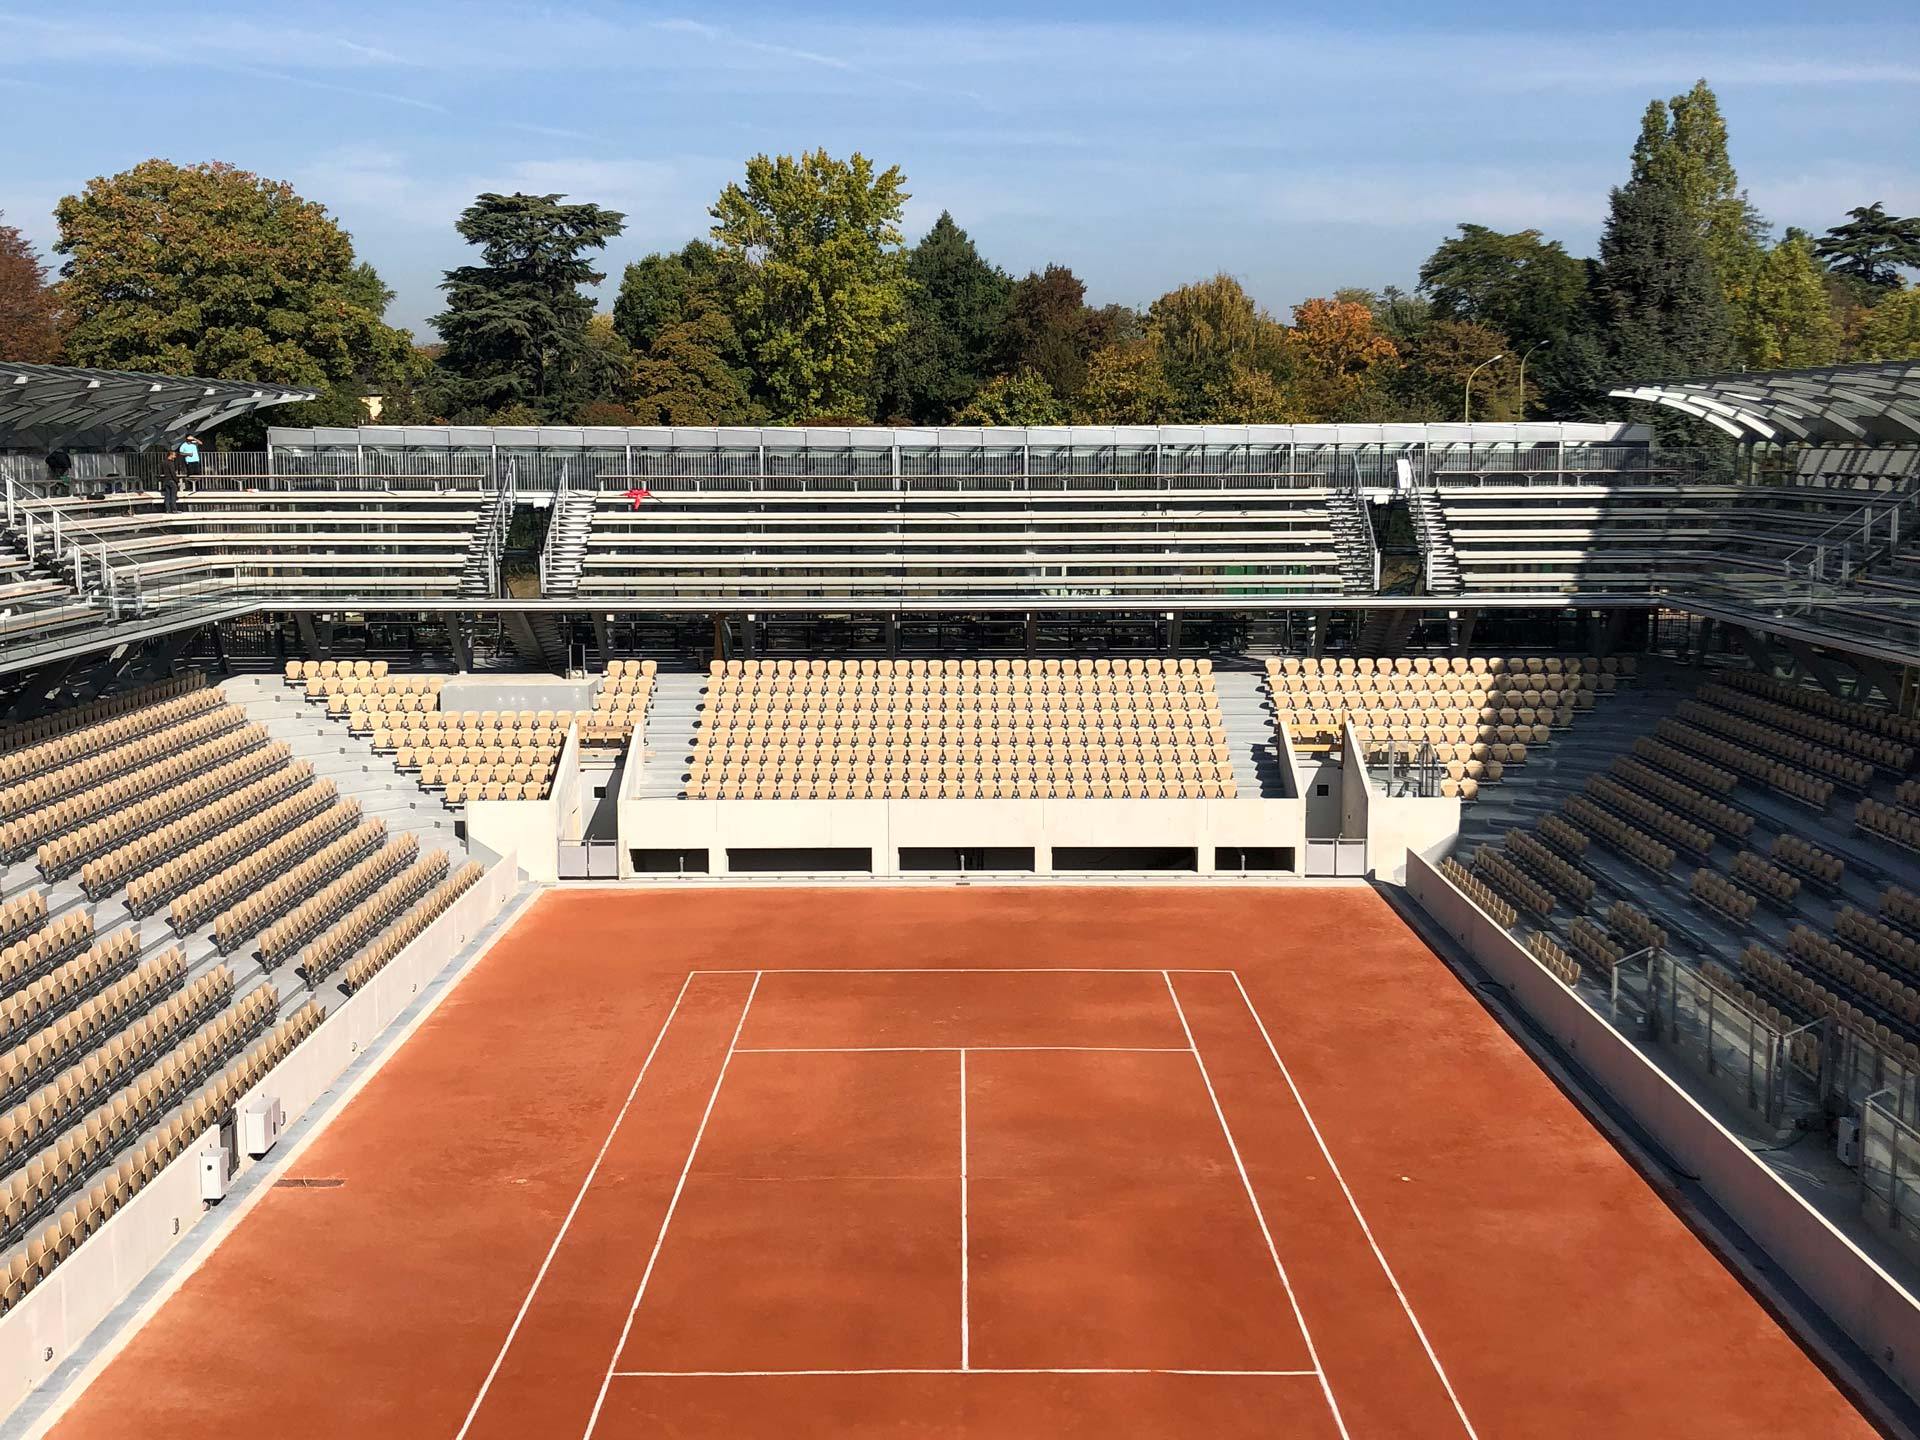 Court Simonne-Mathieu de Roland Garros